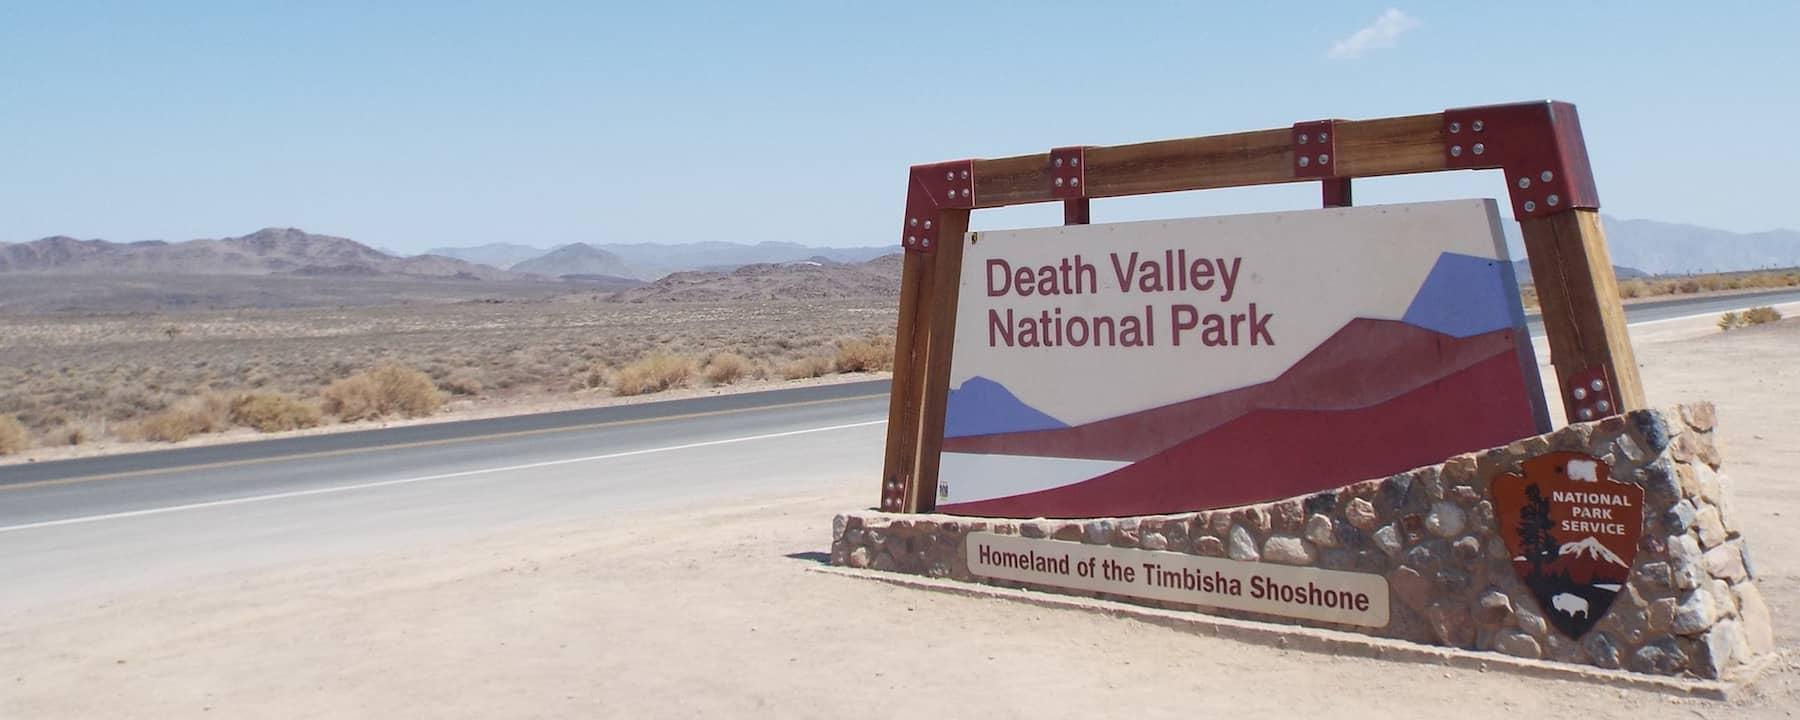 Lone Pine via Death valley